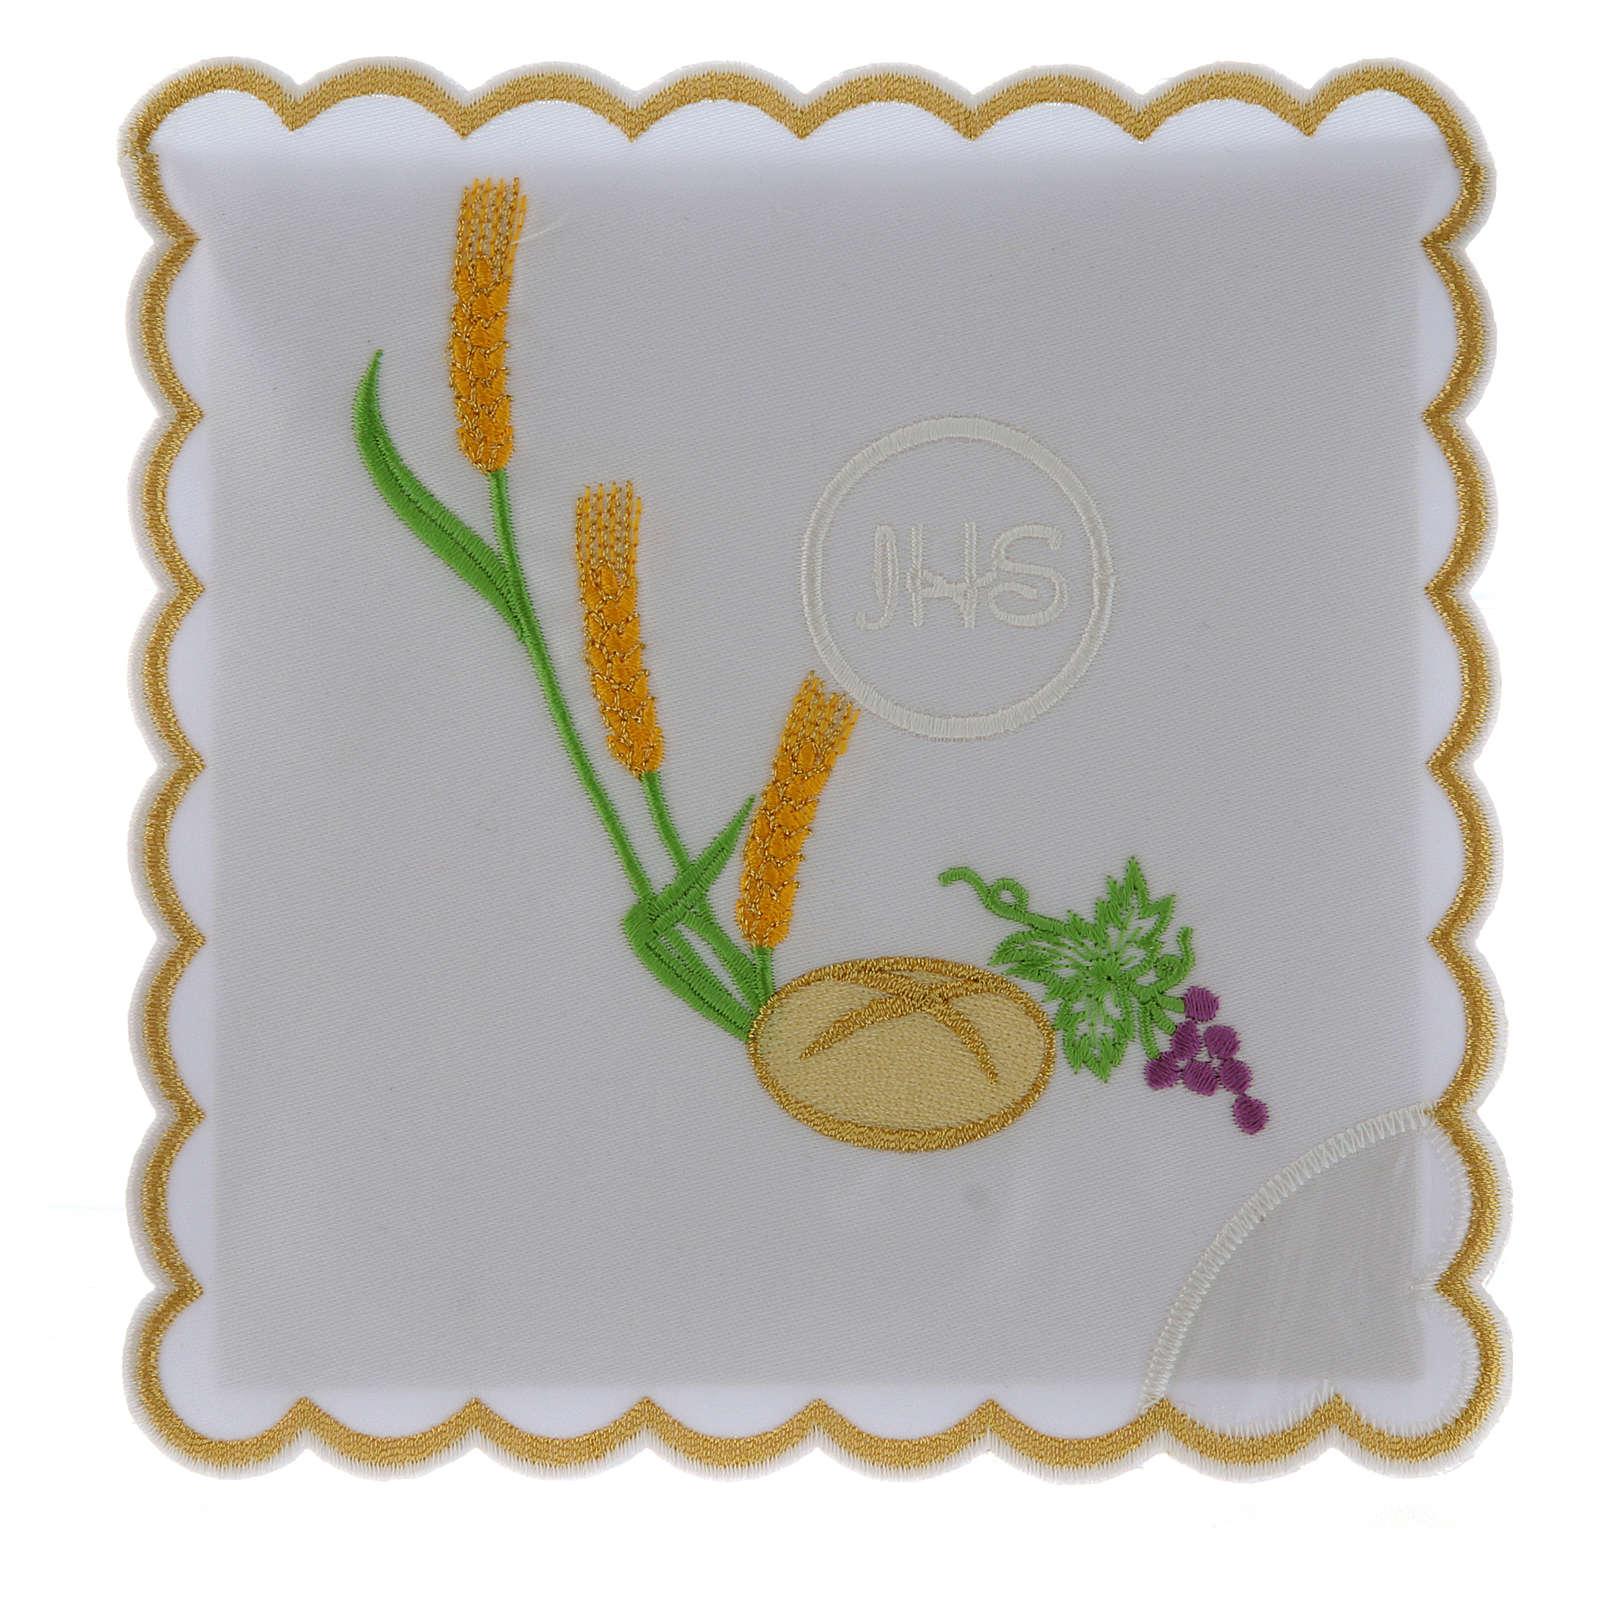 Servicio de altar algodón pan uva espigas símbolo JHS 4